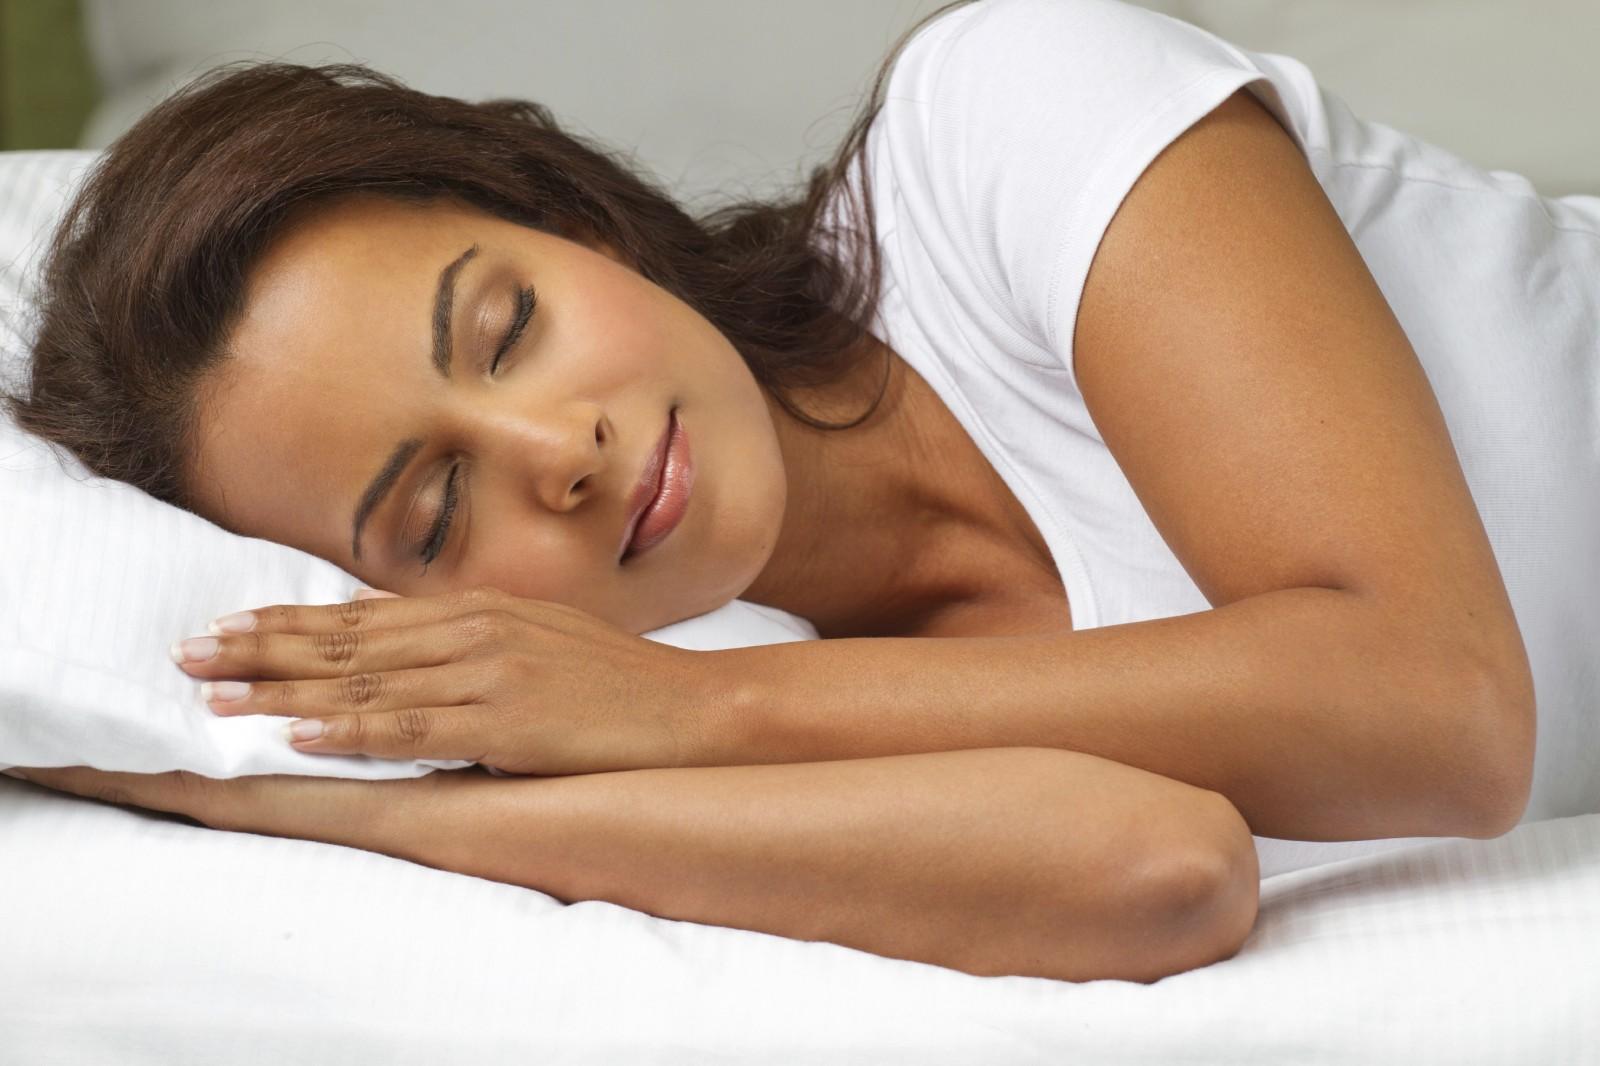 https://www.thetrentonline.com/wp-content/uploads/2013/12/Sleeping-Woman-The-Trent-e1390424458277.jpg